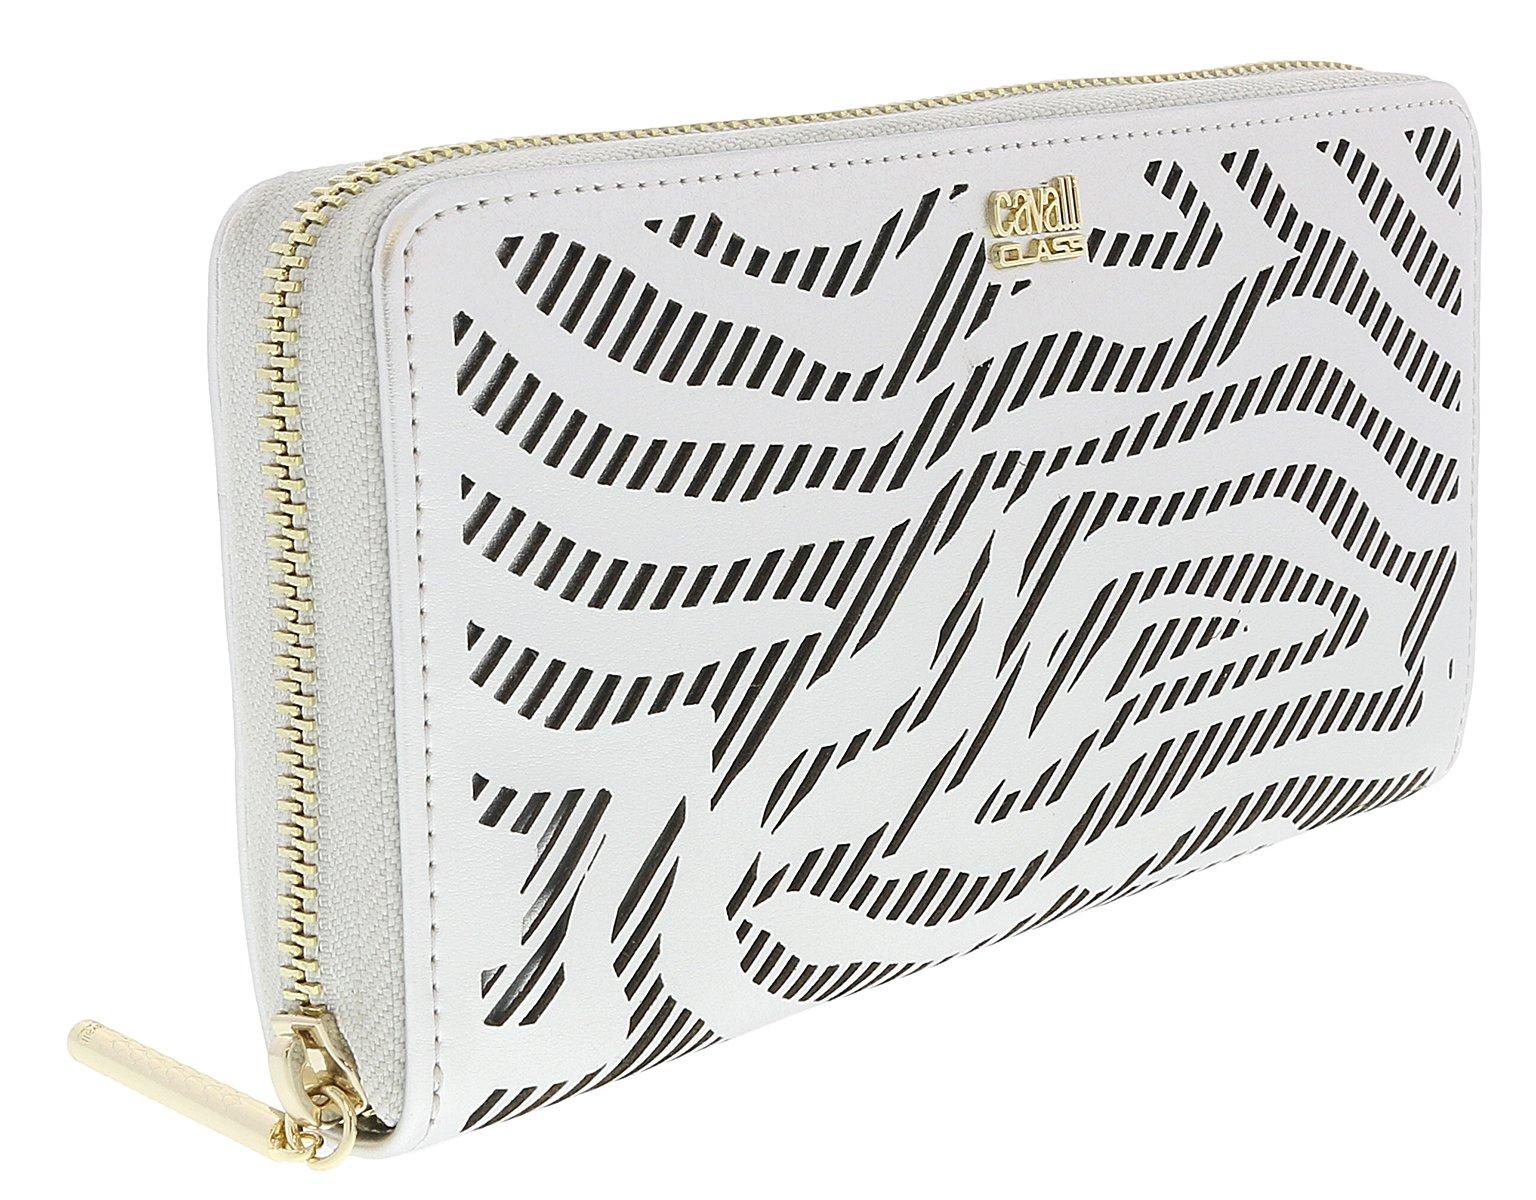 Roberto Cavalli GQLPA3 101 Silver Audrey Long Size Wallet W/Zipper for Womens